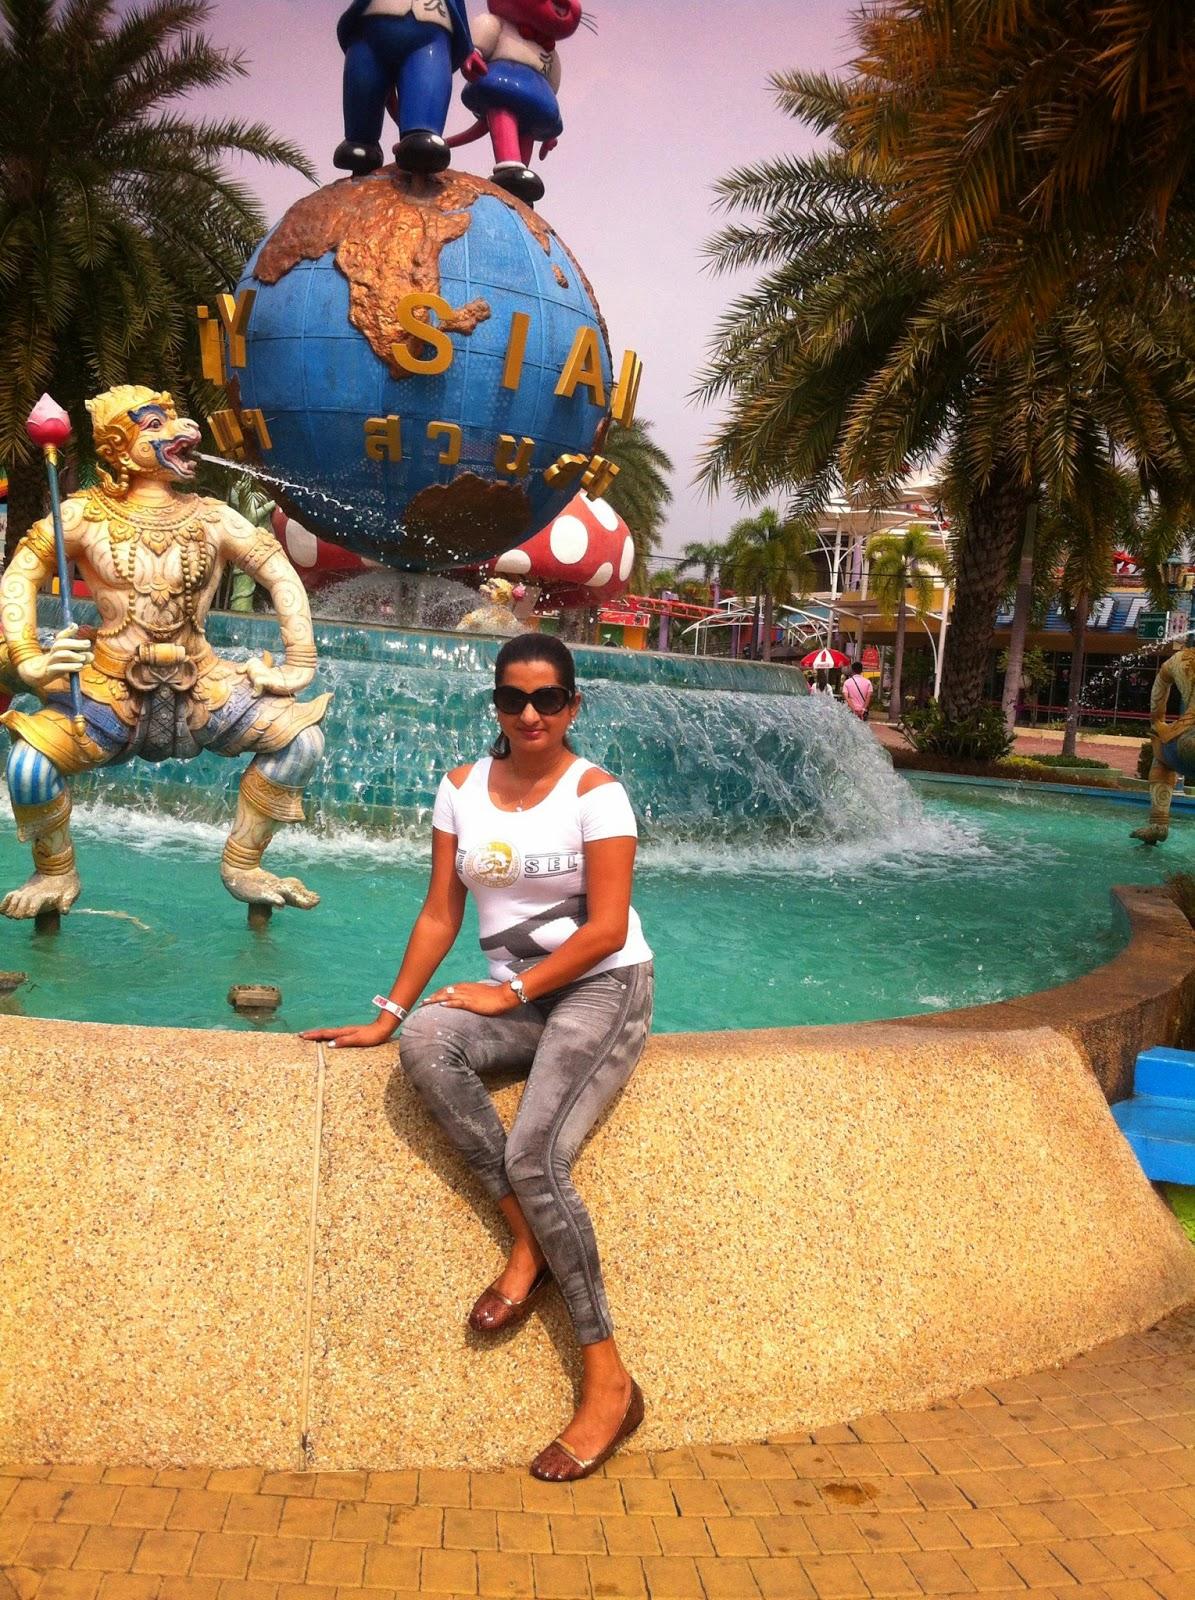 Vasana Danthanarayana tight jeans